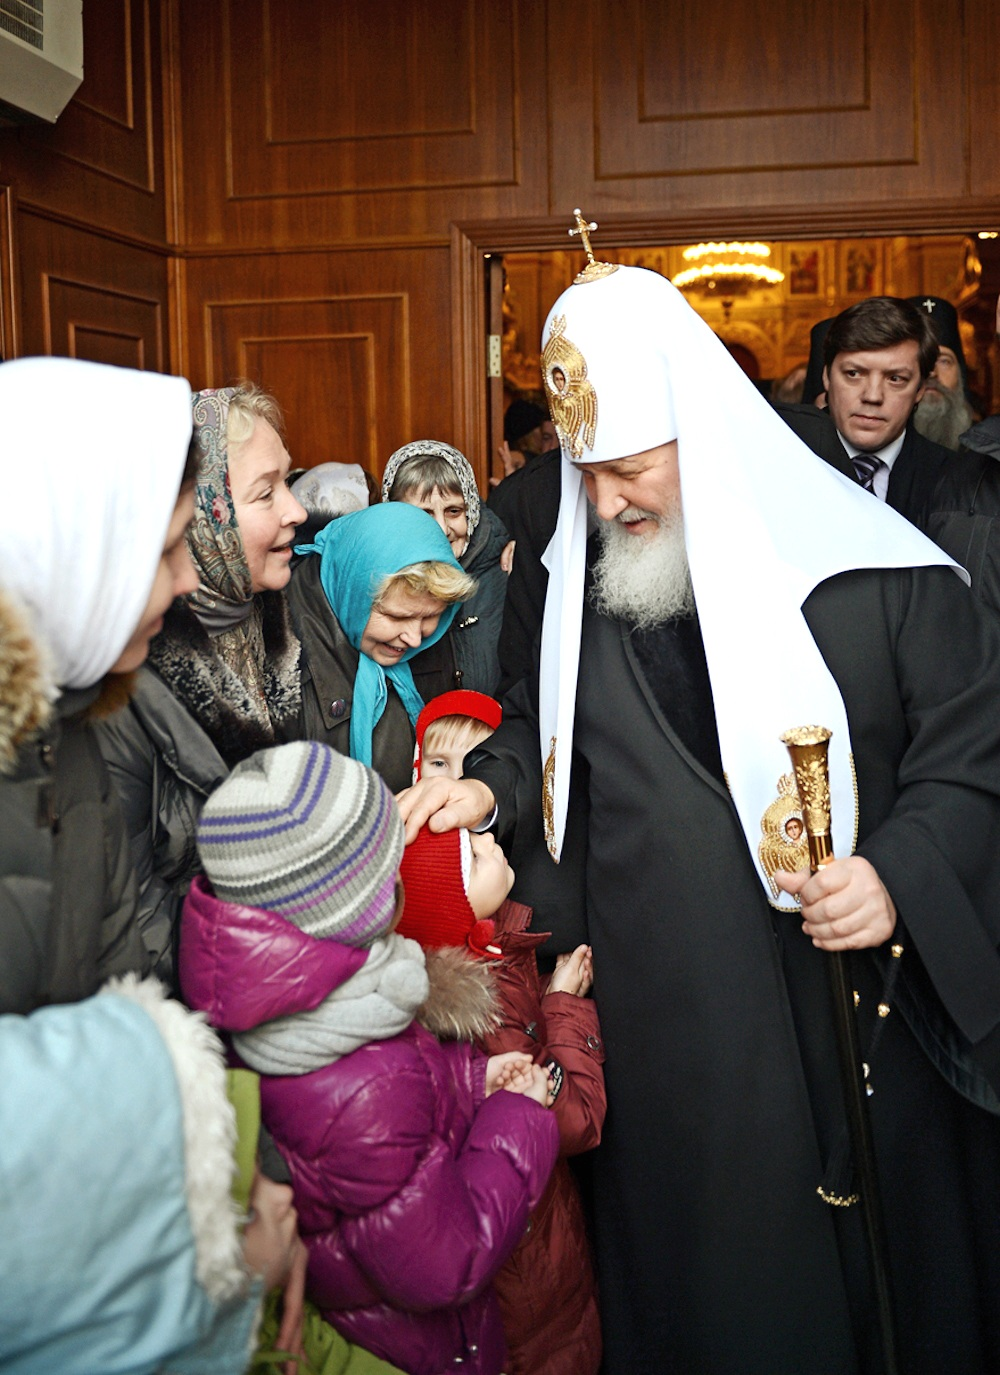 00 Patriarch Kirill on St Nicholas Day 19.12.13. 08.01.14